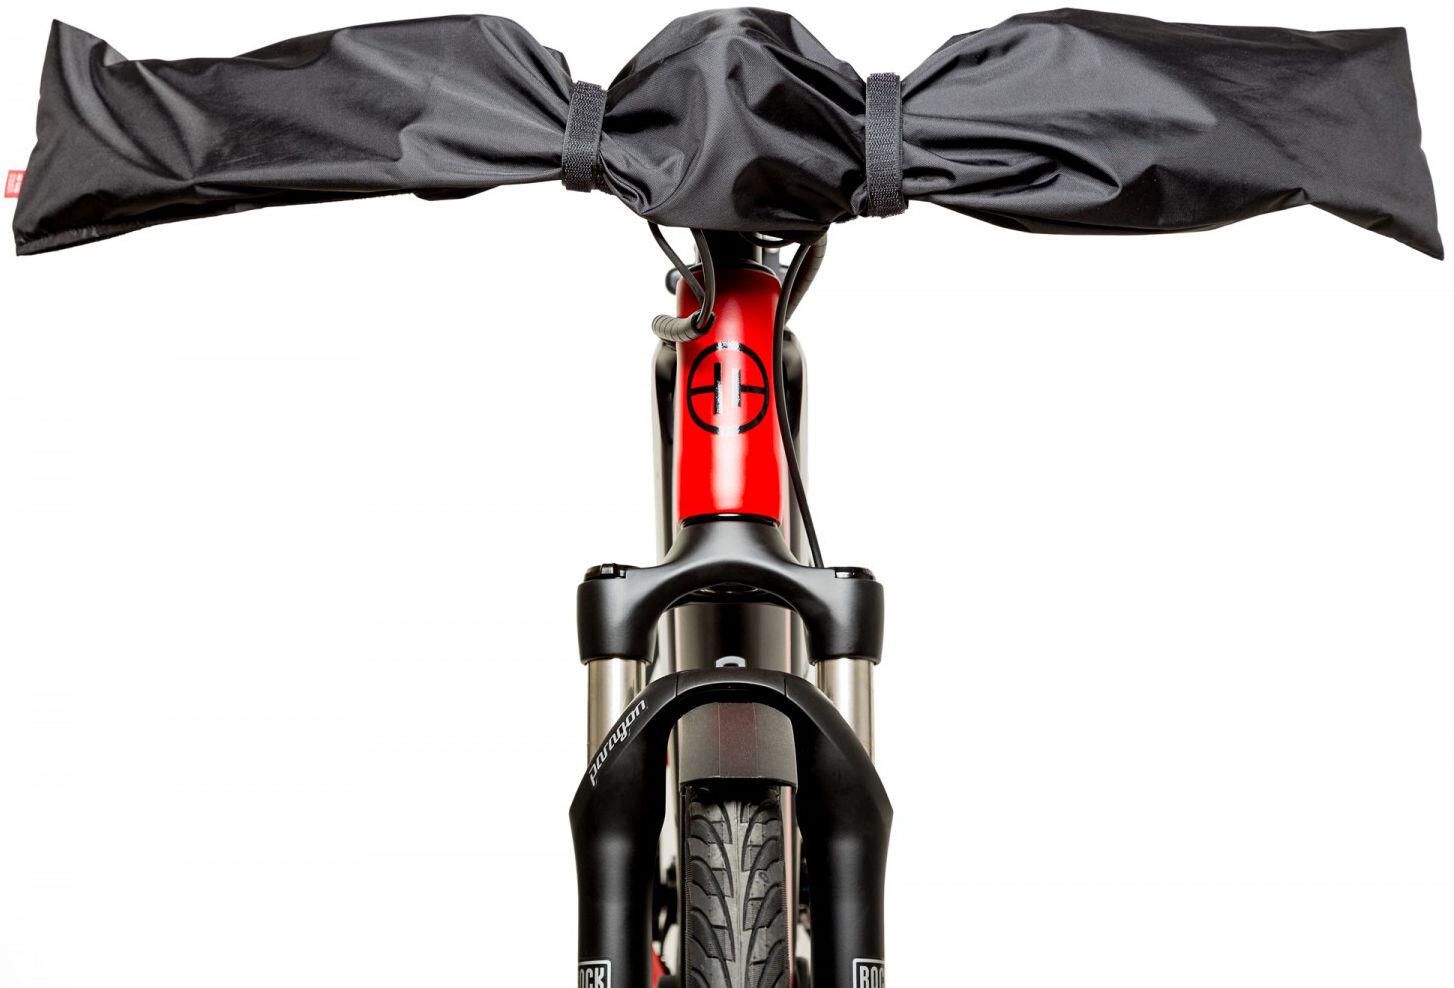 Lenkerschutz in Fahrrad Lenker günstig kaufen | eBay